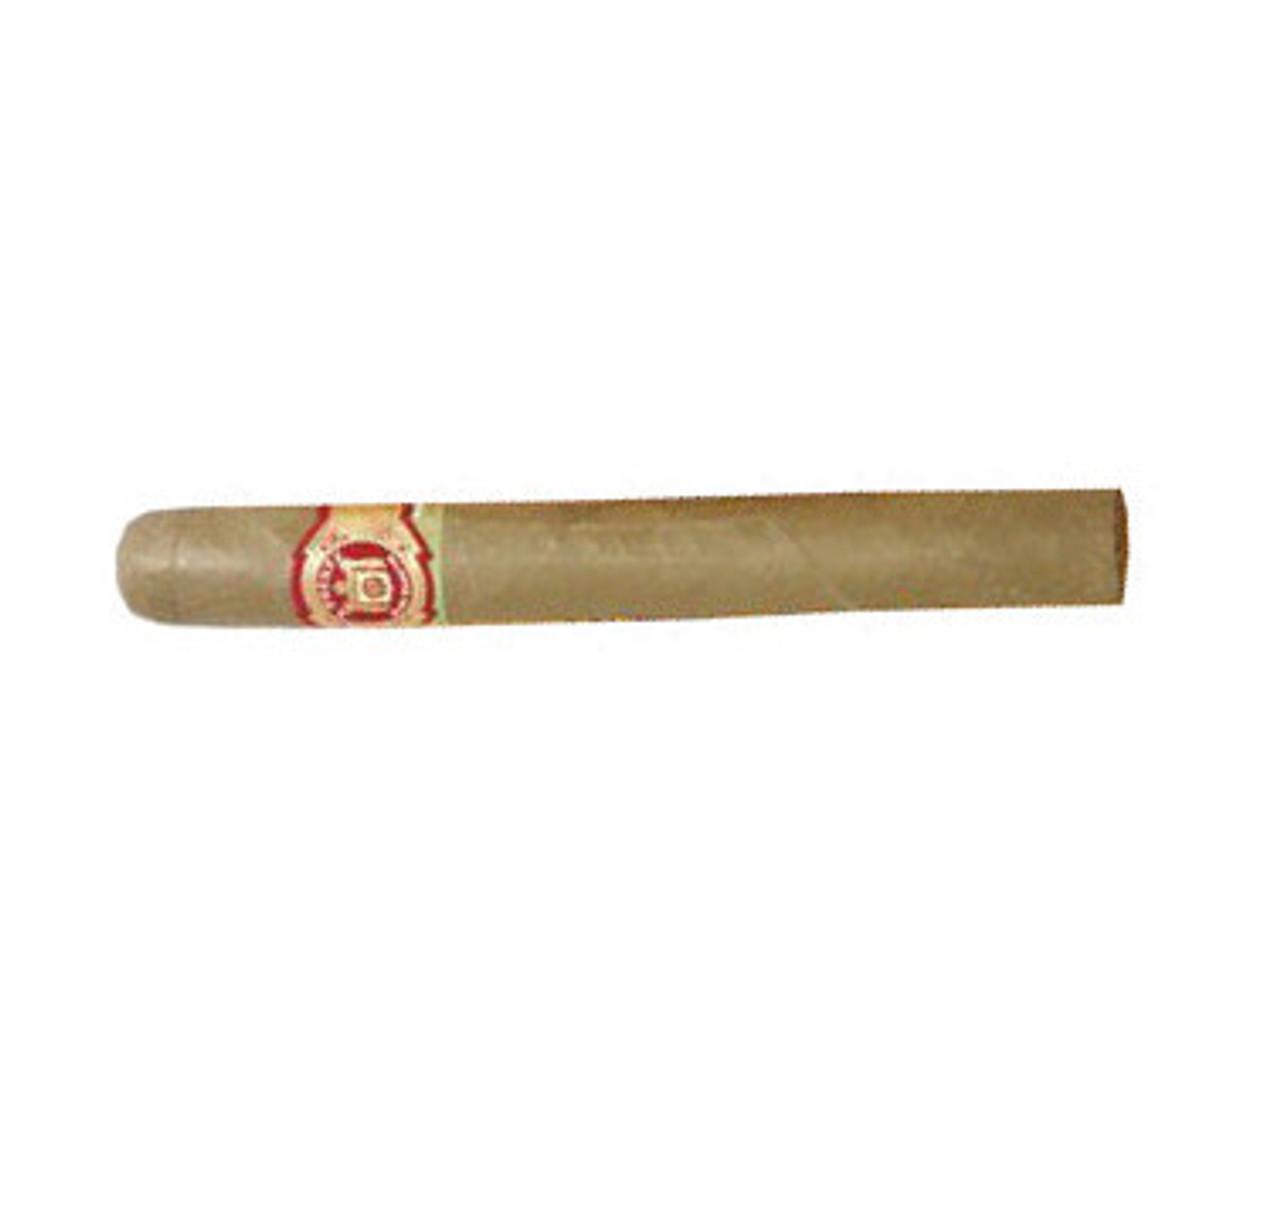 Arturo Fuente 8-5-8 XC Cigars - 6 x 47 (Box of 25)